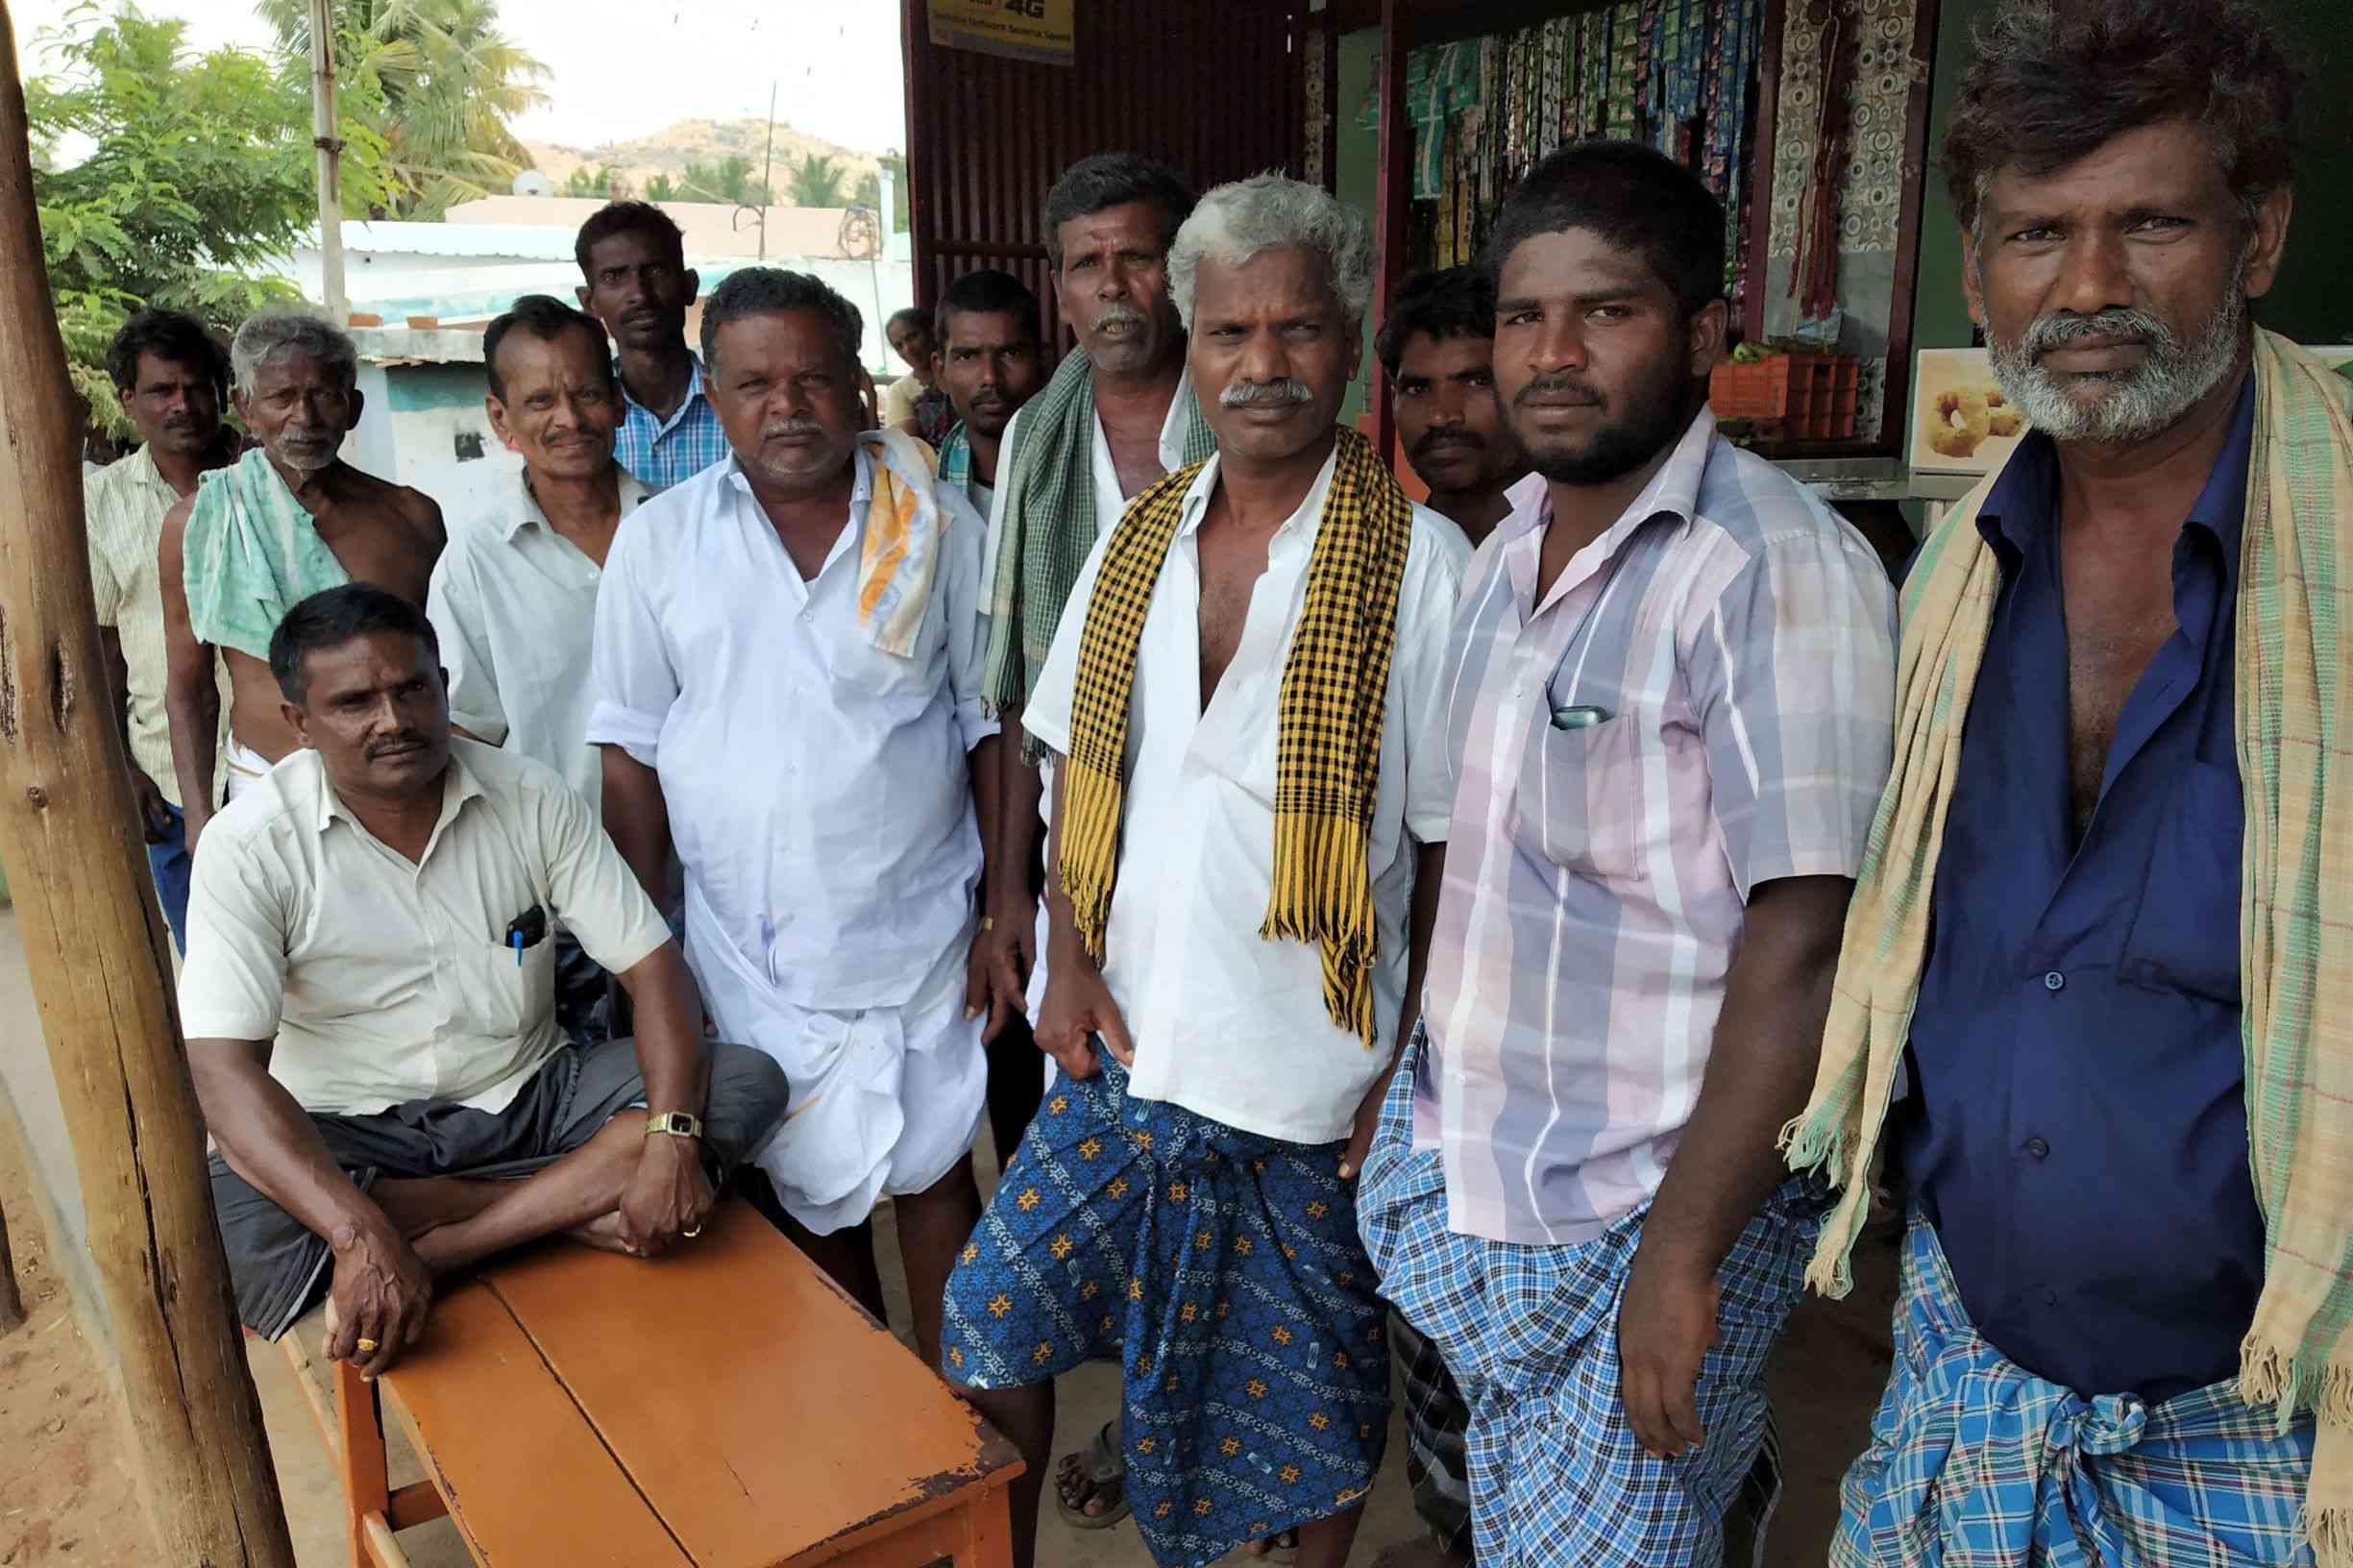 Many Kallars in Theni are backing the Amma Makkal Munnetra Kazhagam. Photo credit: Sruthisagar Yamunan